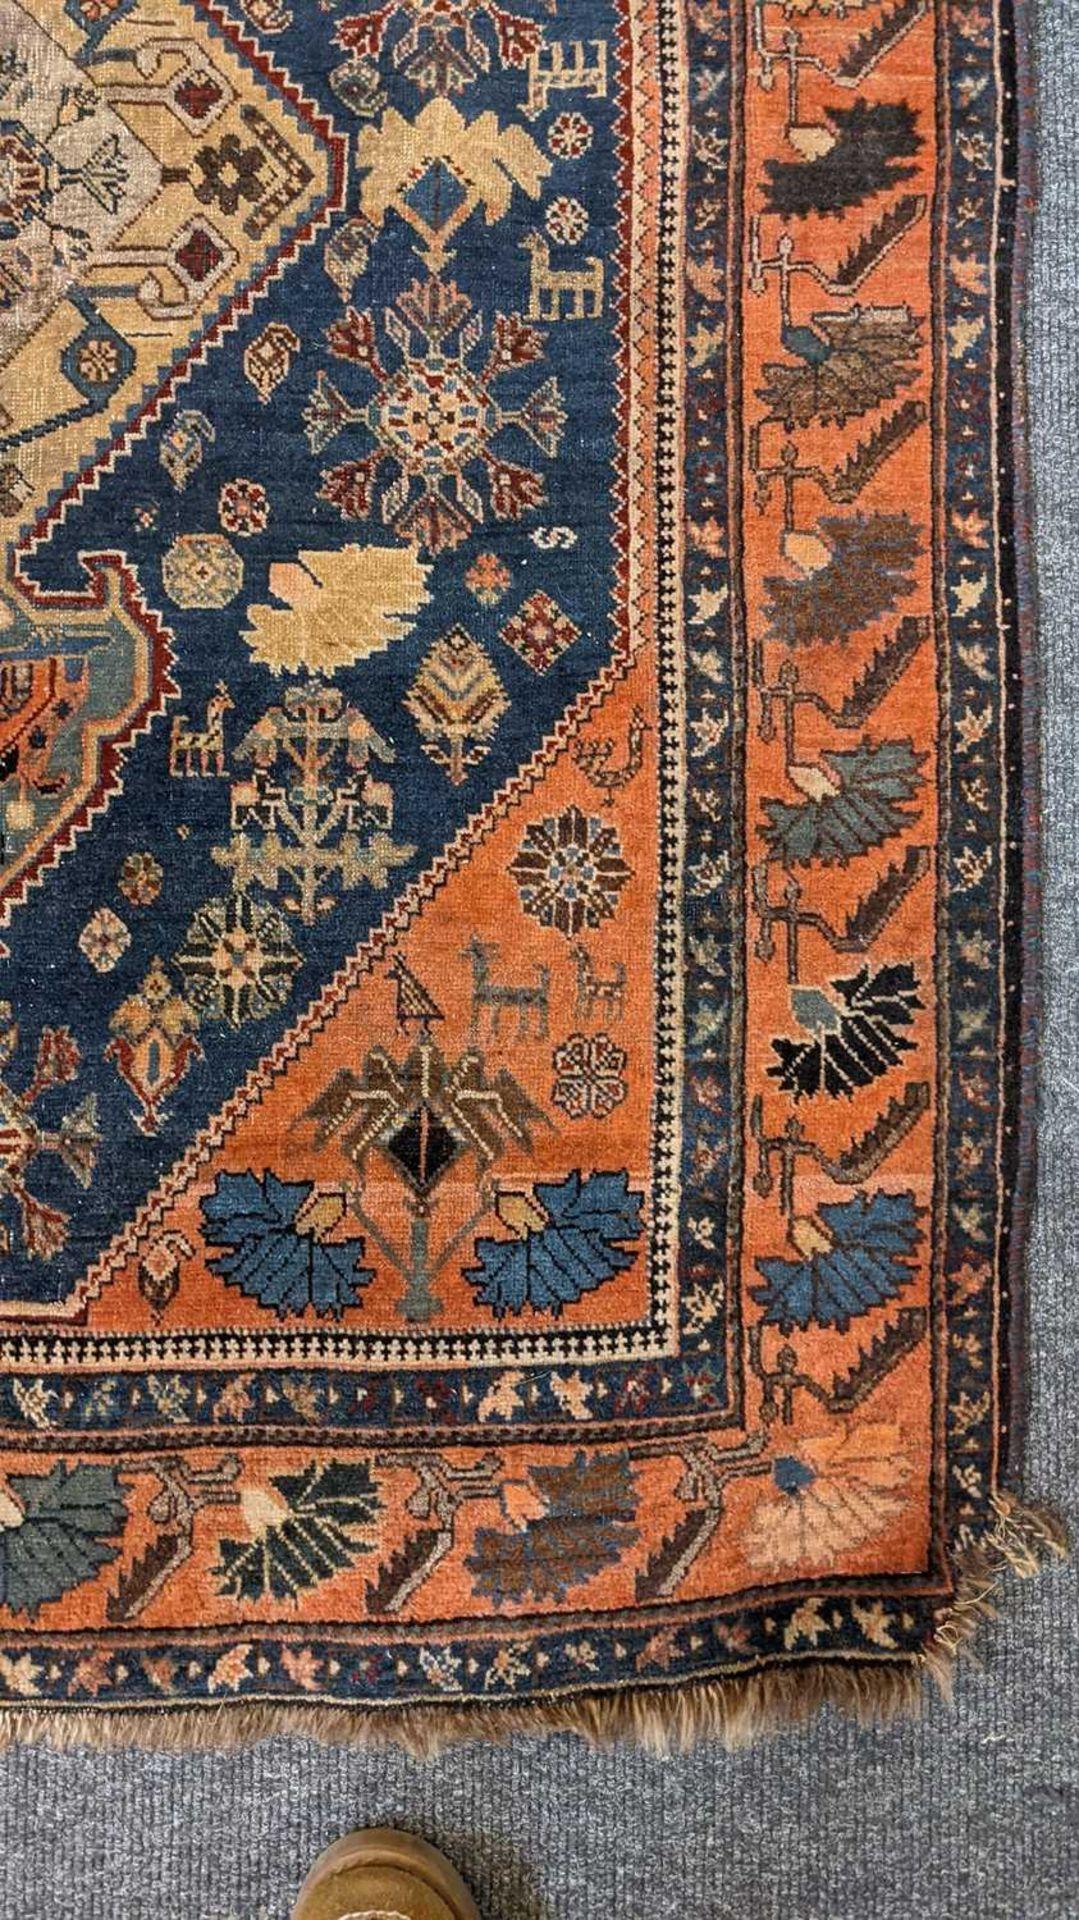 An Afghan Beshir rug, - Image 7 of 17